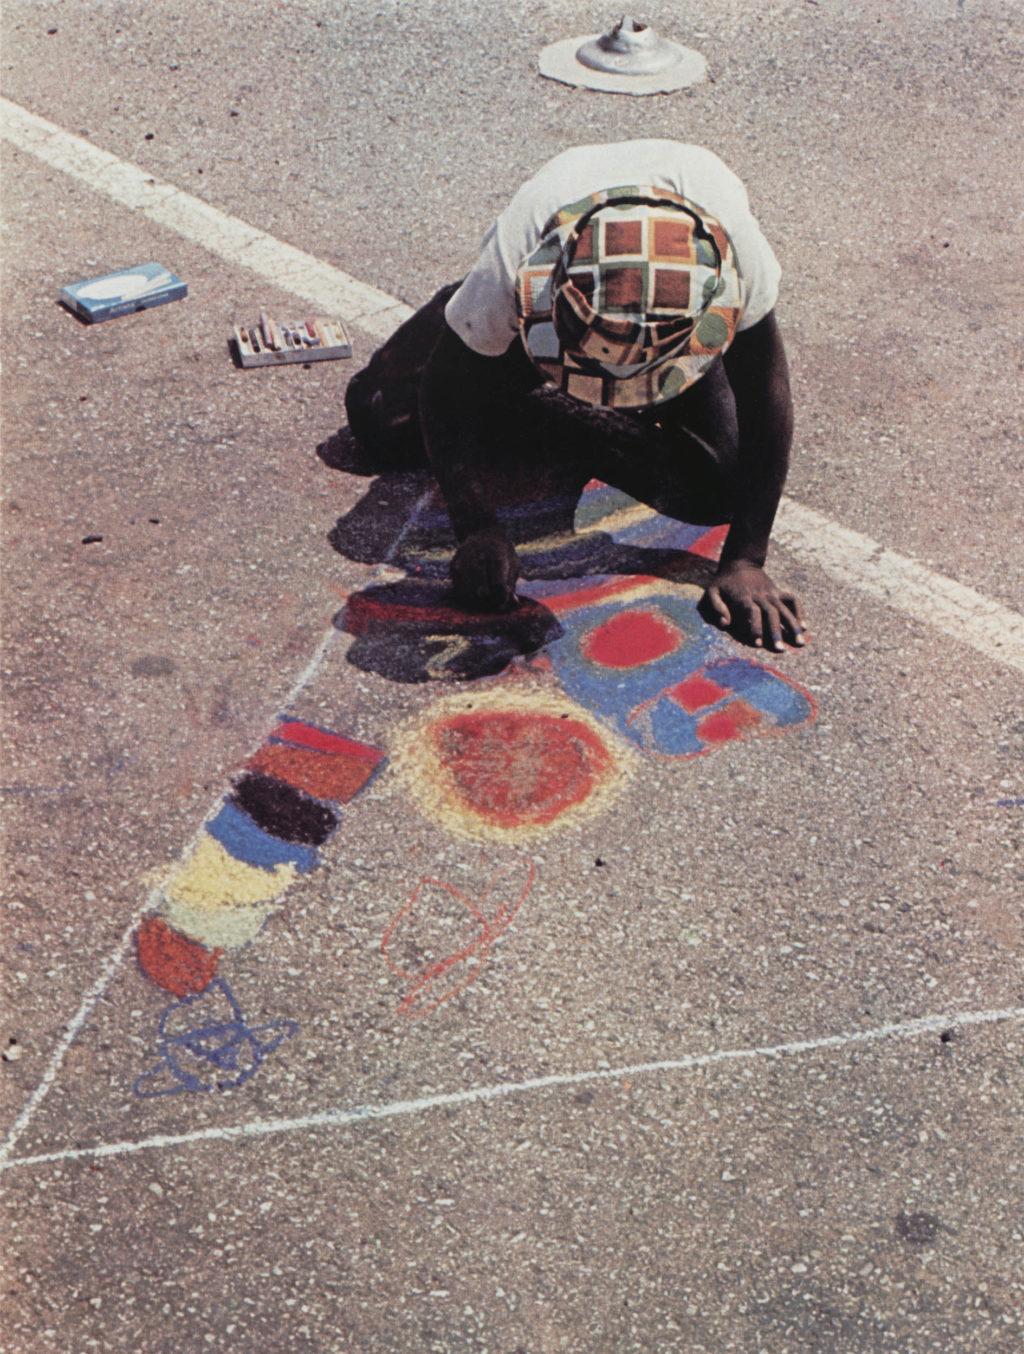 Hank Willis Thomas, Exxon: Black Street Art, 1973/2006